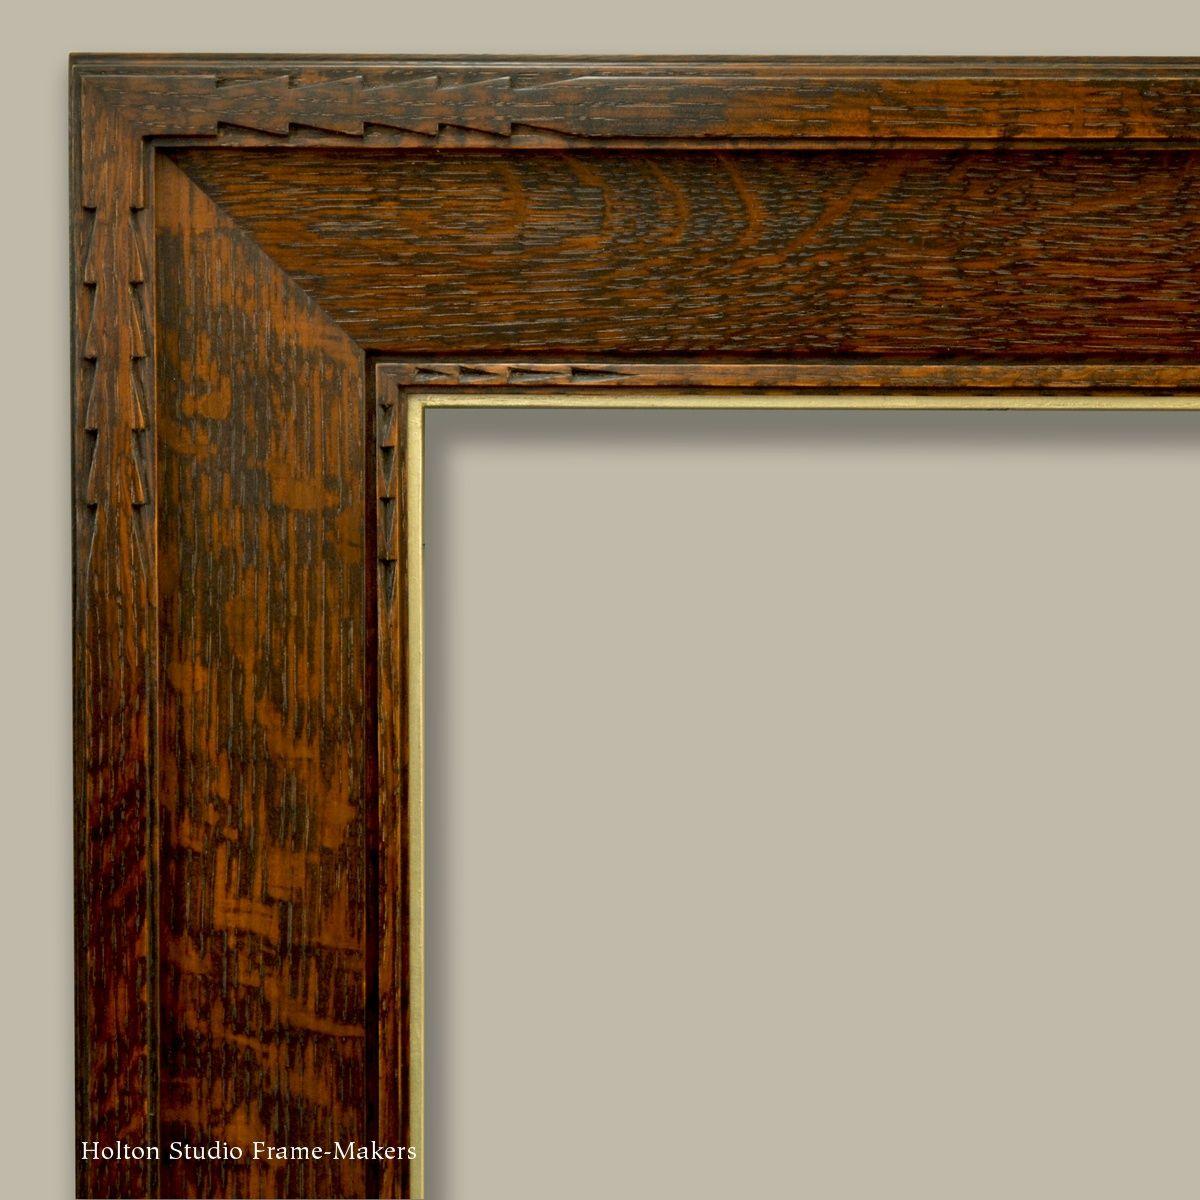 Framing Mick McGinty - Holton Studio Frame-Makers   Framing ...